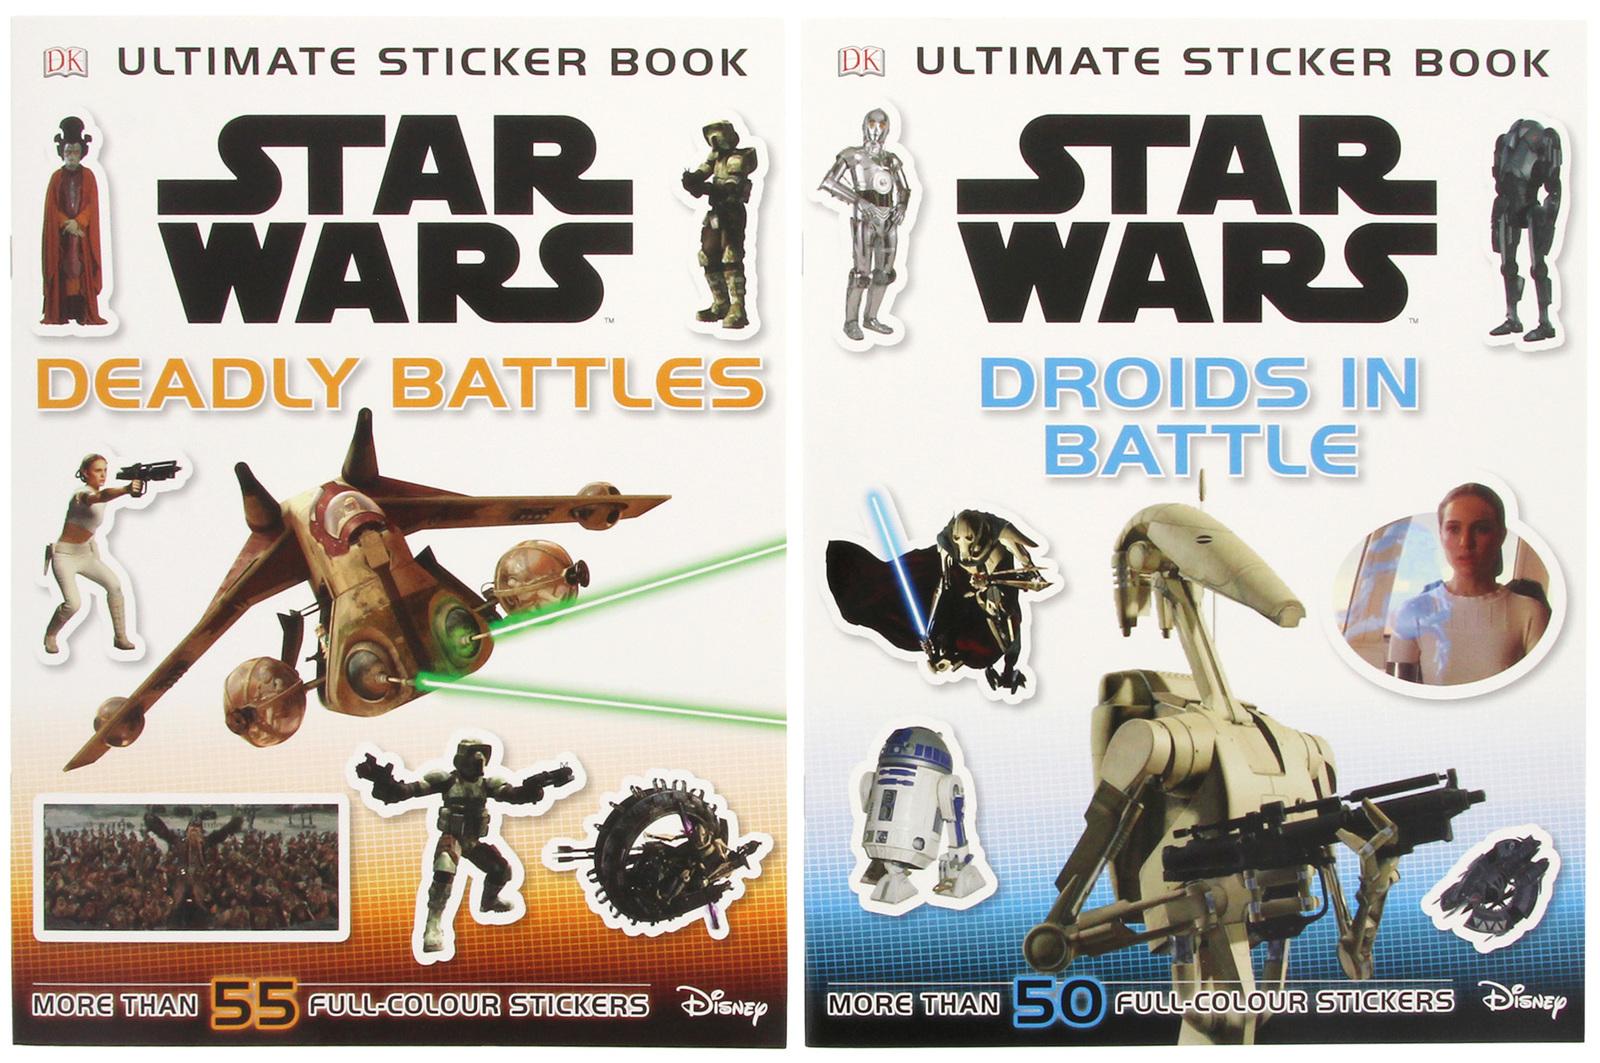 Star Wars Sticker Adventures - Boxed Set by DK image